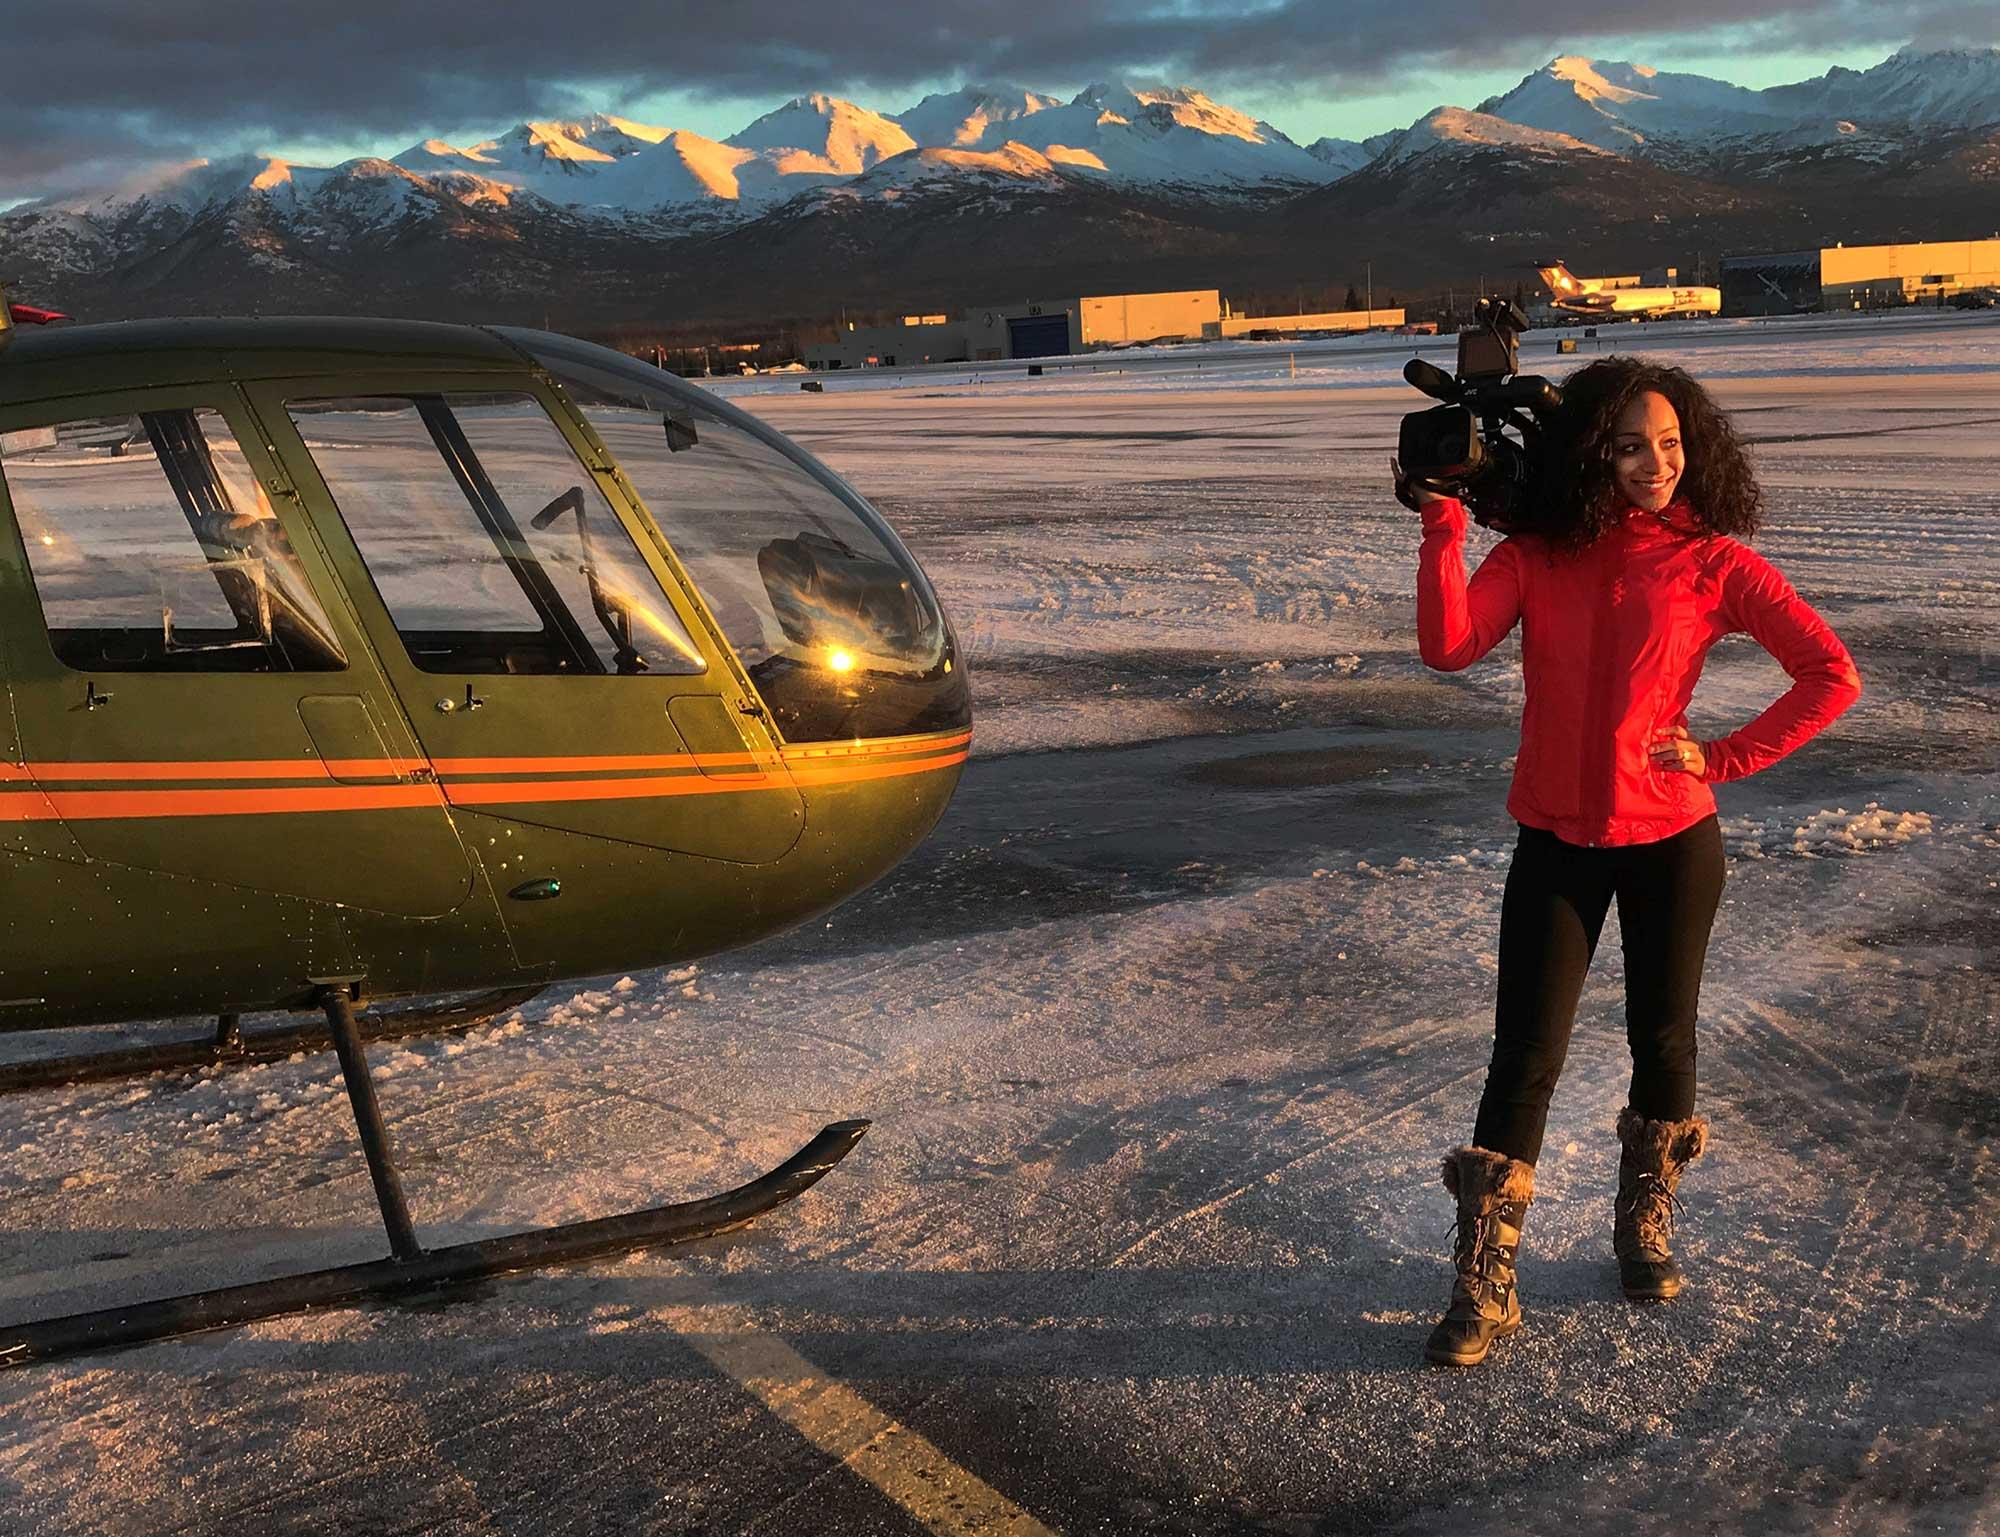 Art Of Aviation Photography - Aircraft Photography & Portraits Alaskafoto